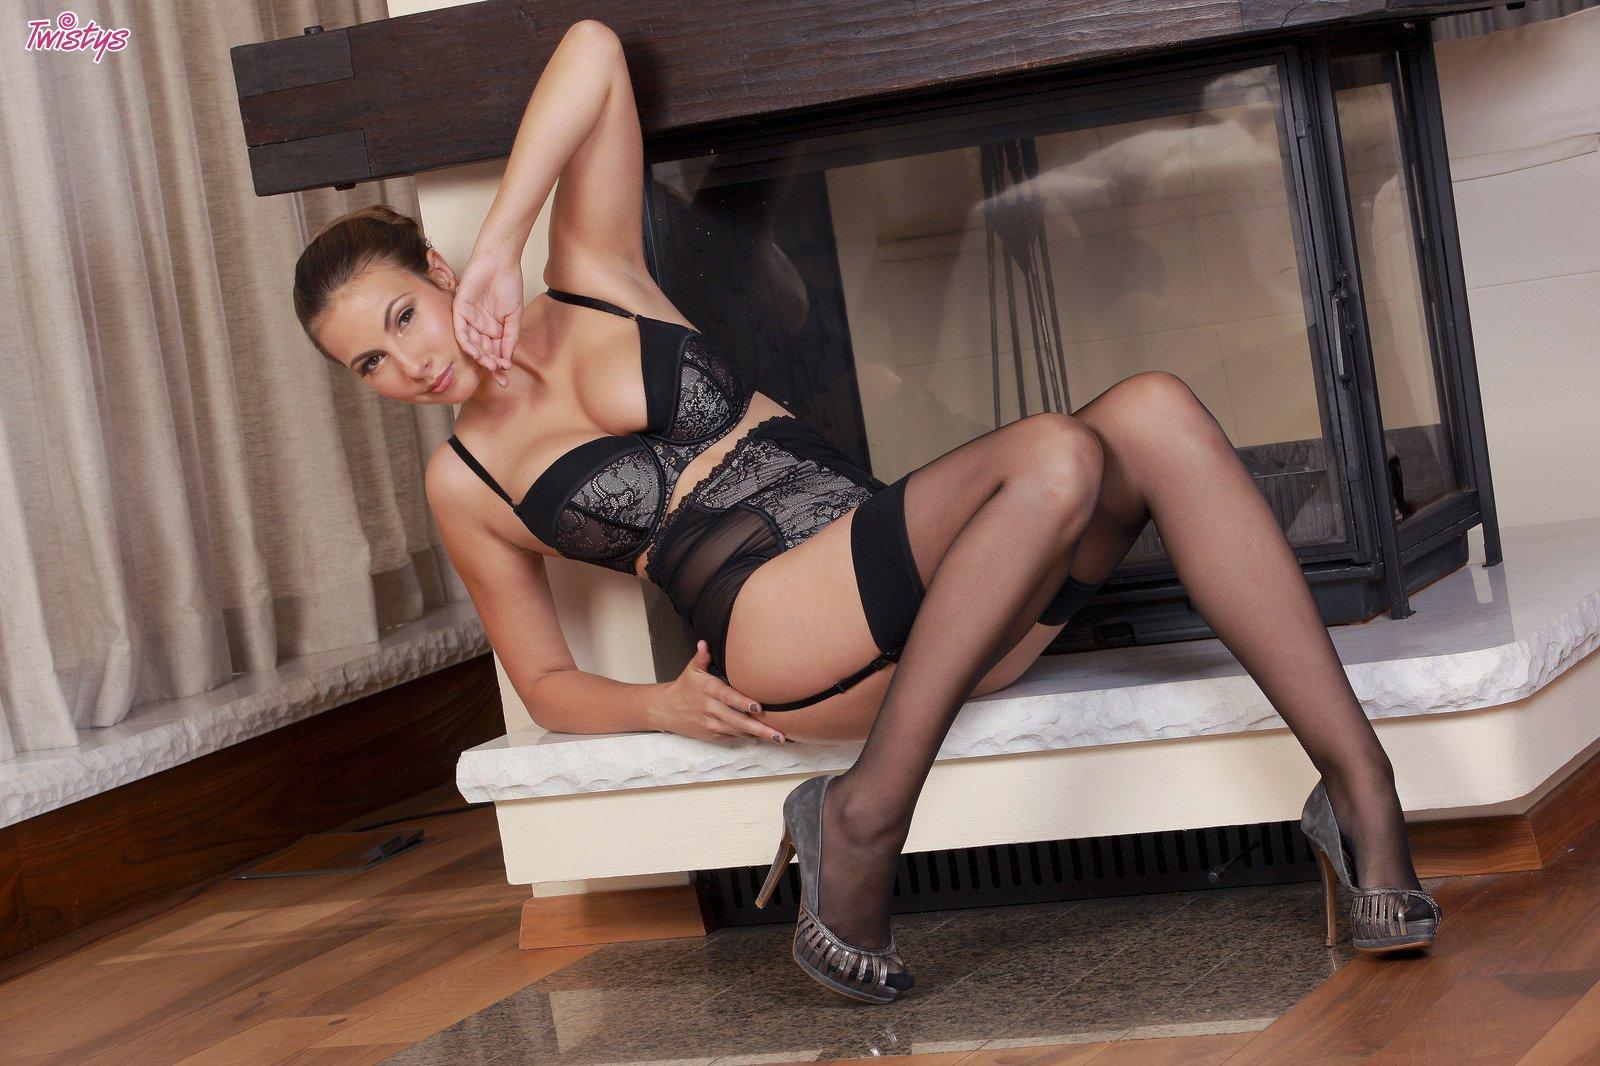 Flirtatious Pose Sexy Lace Garter Bow Garter Stockings The Temptation Black Suit Garters